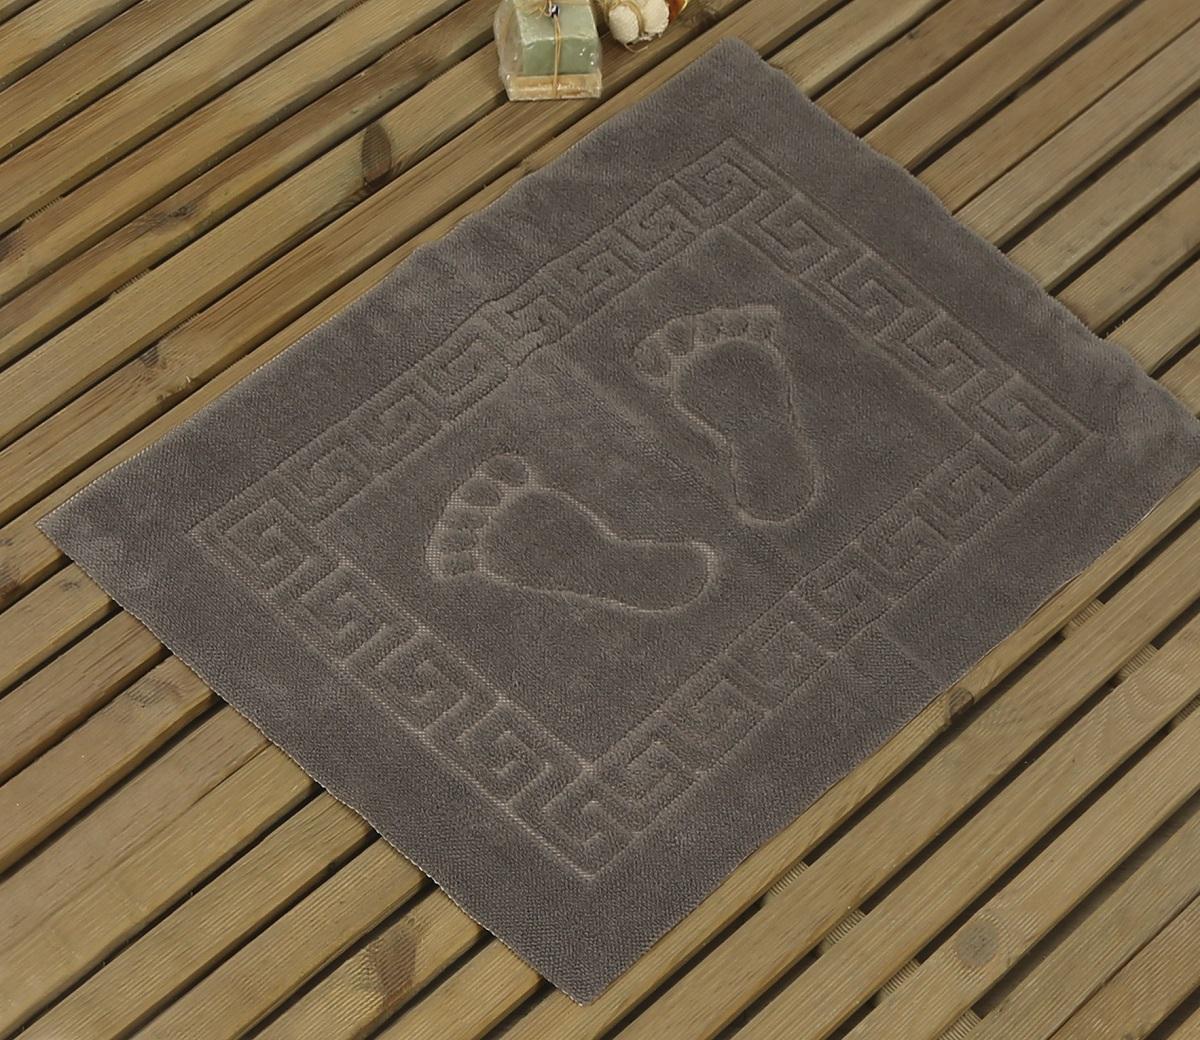 Коврик для ванной Karna Likya , цвет: серый, 50 х 70 см631/CHAR011